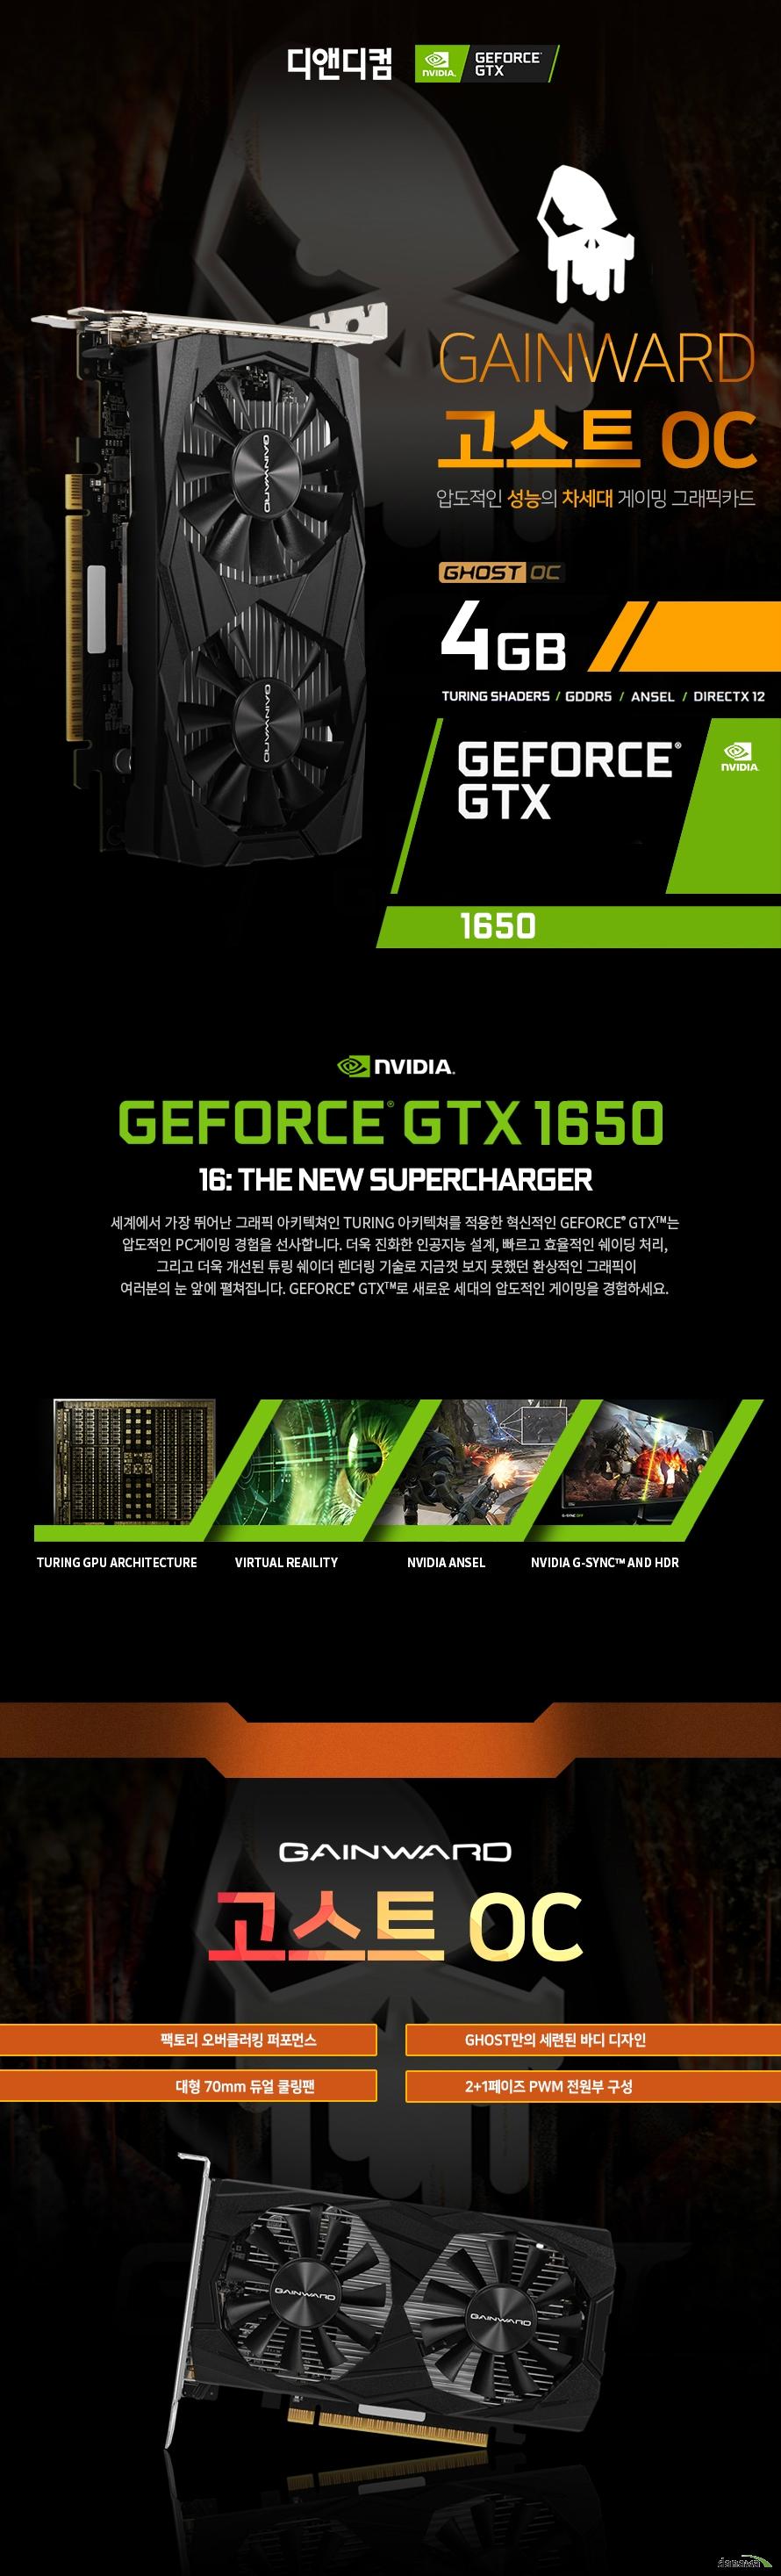 GAINWARD 지포스 GTX 1650 고스트 OC D5 4GB 디앤디컴 제품상세정보 프로세서 코어 896 베이스클럭 1485MHz 부스트클럭 1815MHz 메모리속도 8000MHz 메모리용량 4GB 메모리인터페이스 GDDR5 128bit 모니터동시지원 3대 최대해상도 7680*4320 출력포트 DP1.4 *2,HDMI2.0 *1 그래픽카드 소모전력 75W 최소시스템요구전력 300W 전원커넥터 6-PIN 제품사이즈 170mm*99mm*38mm 제품인증 R-R-DND-GW-G1650-GT 품질보증 3년무상보증